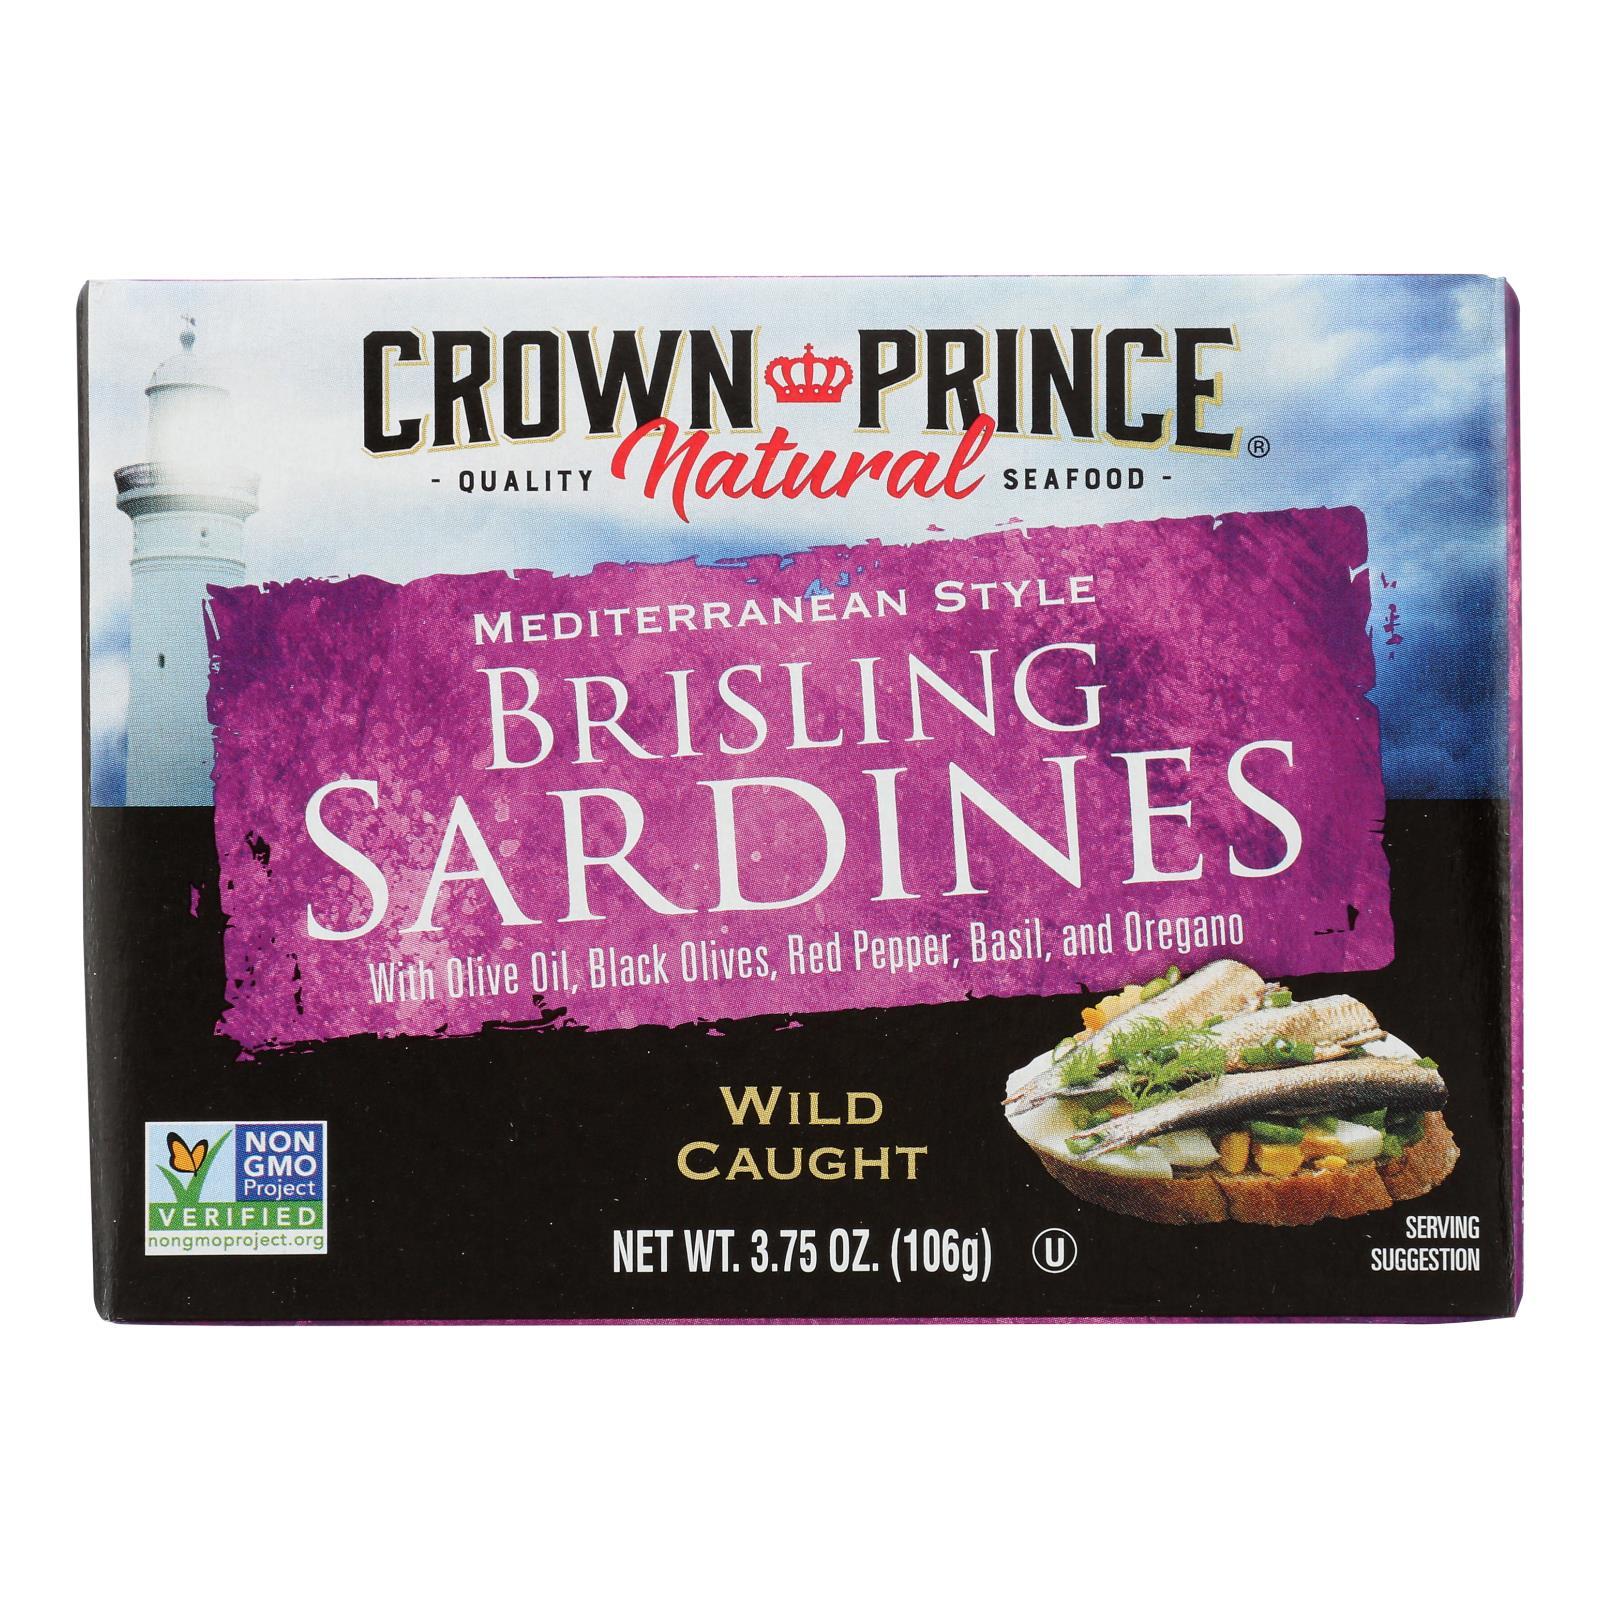 Crown Prince Brisling Sardines - Mediterranean Style - Case of 12 - 3.75 oz.